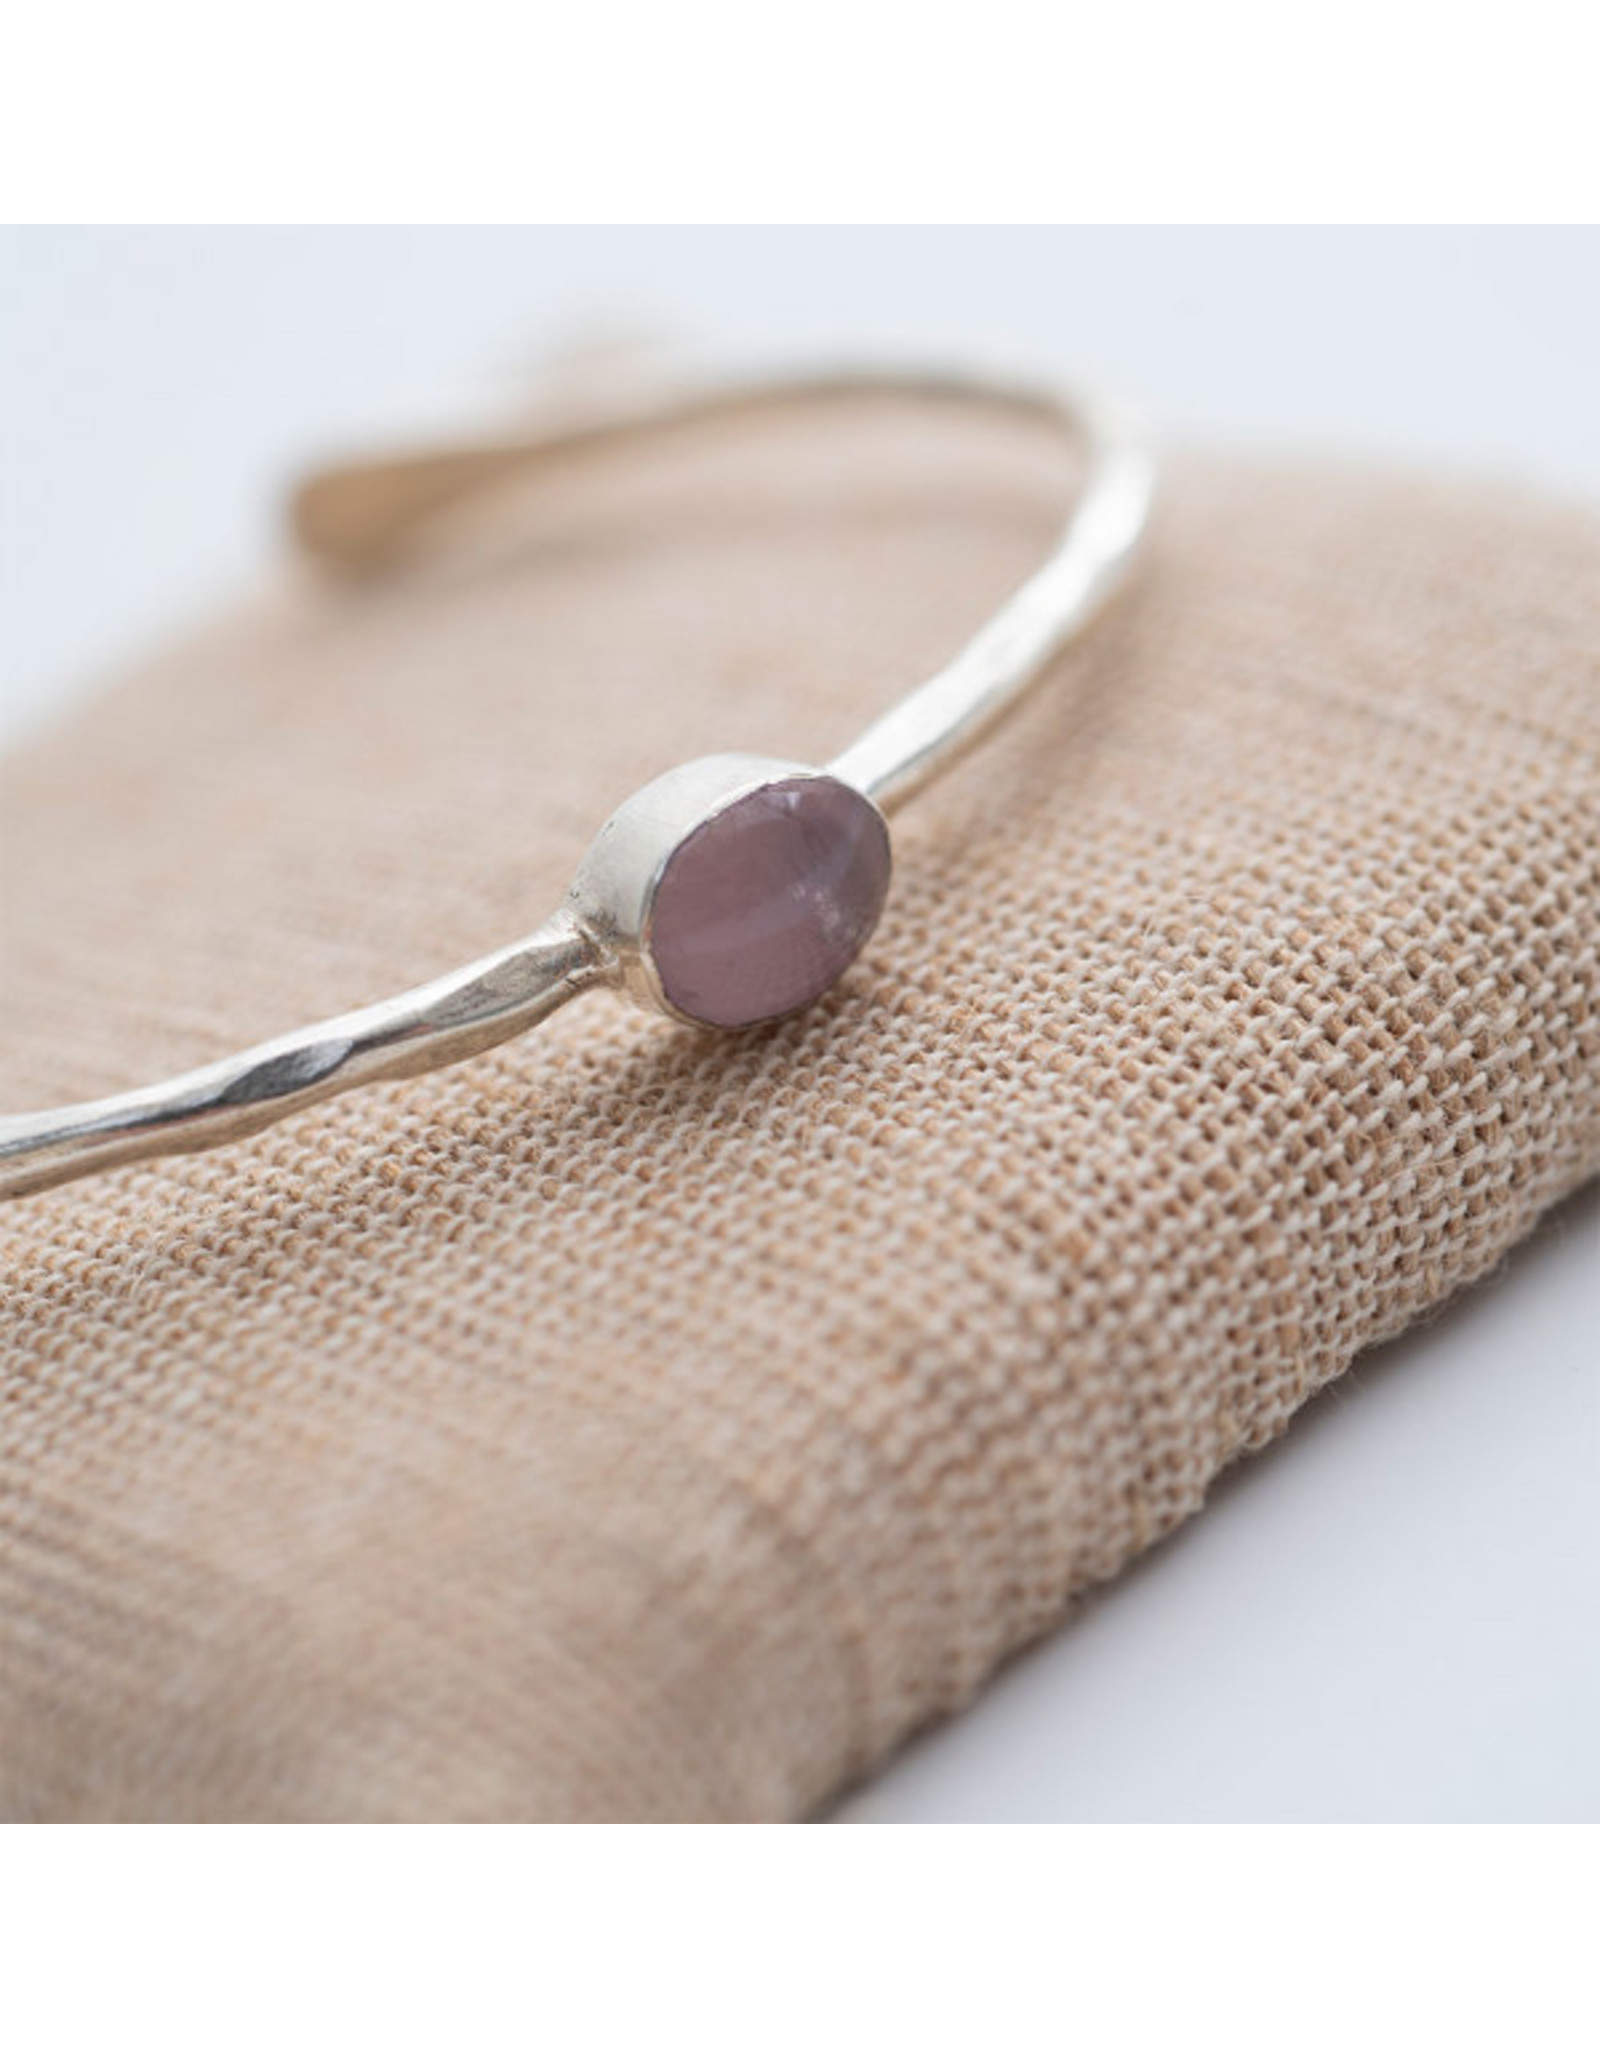 A beautiful Story Moon light Rose Quartz Silver Bracelet